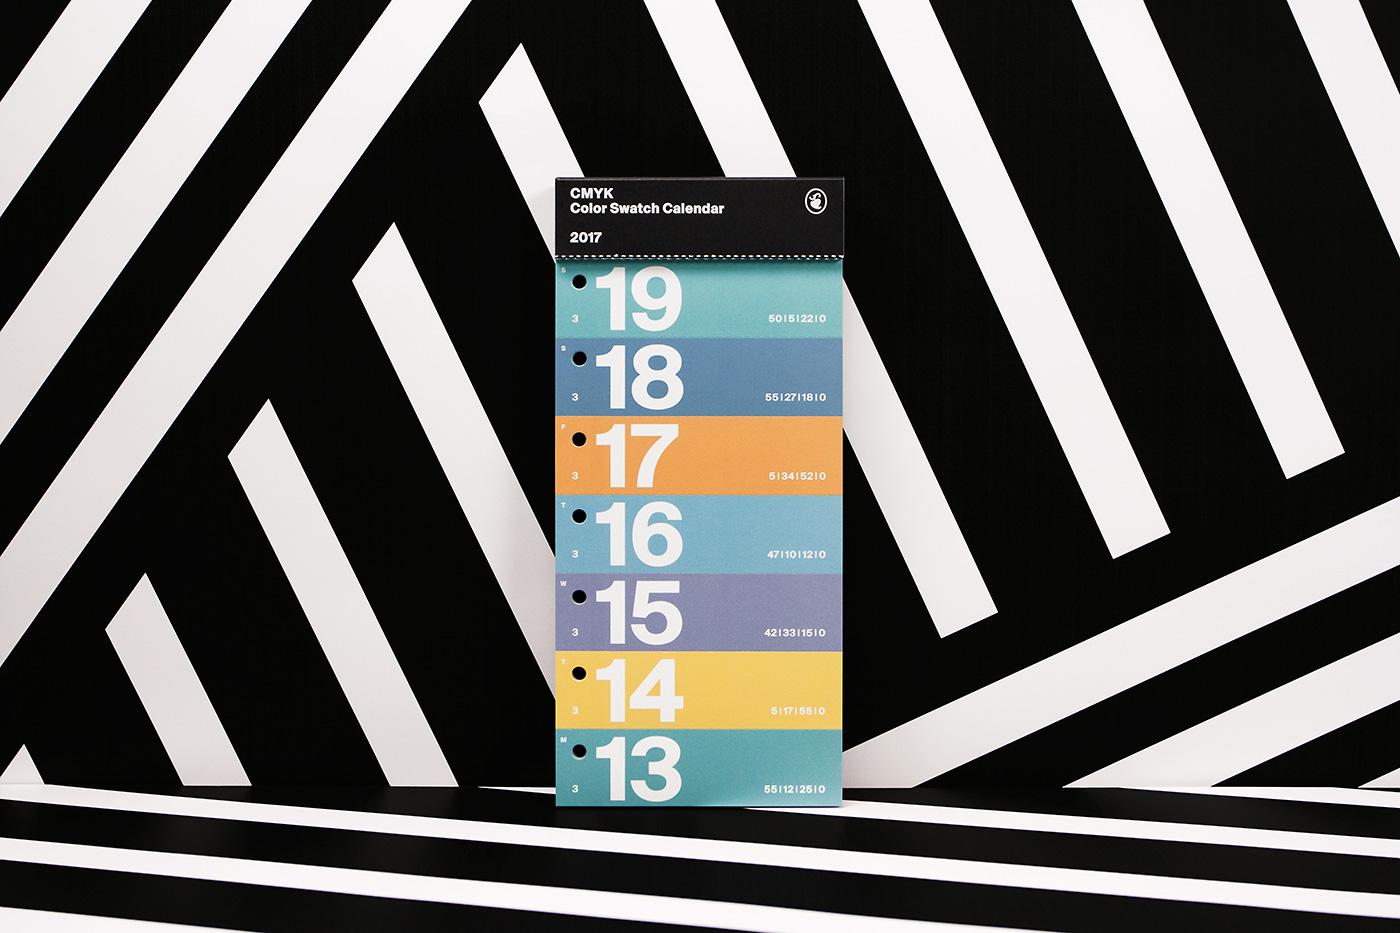 Color Swatch Calendar 2017 13